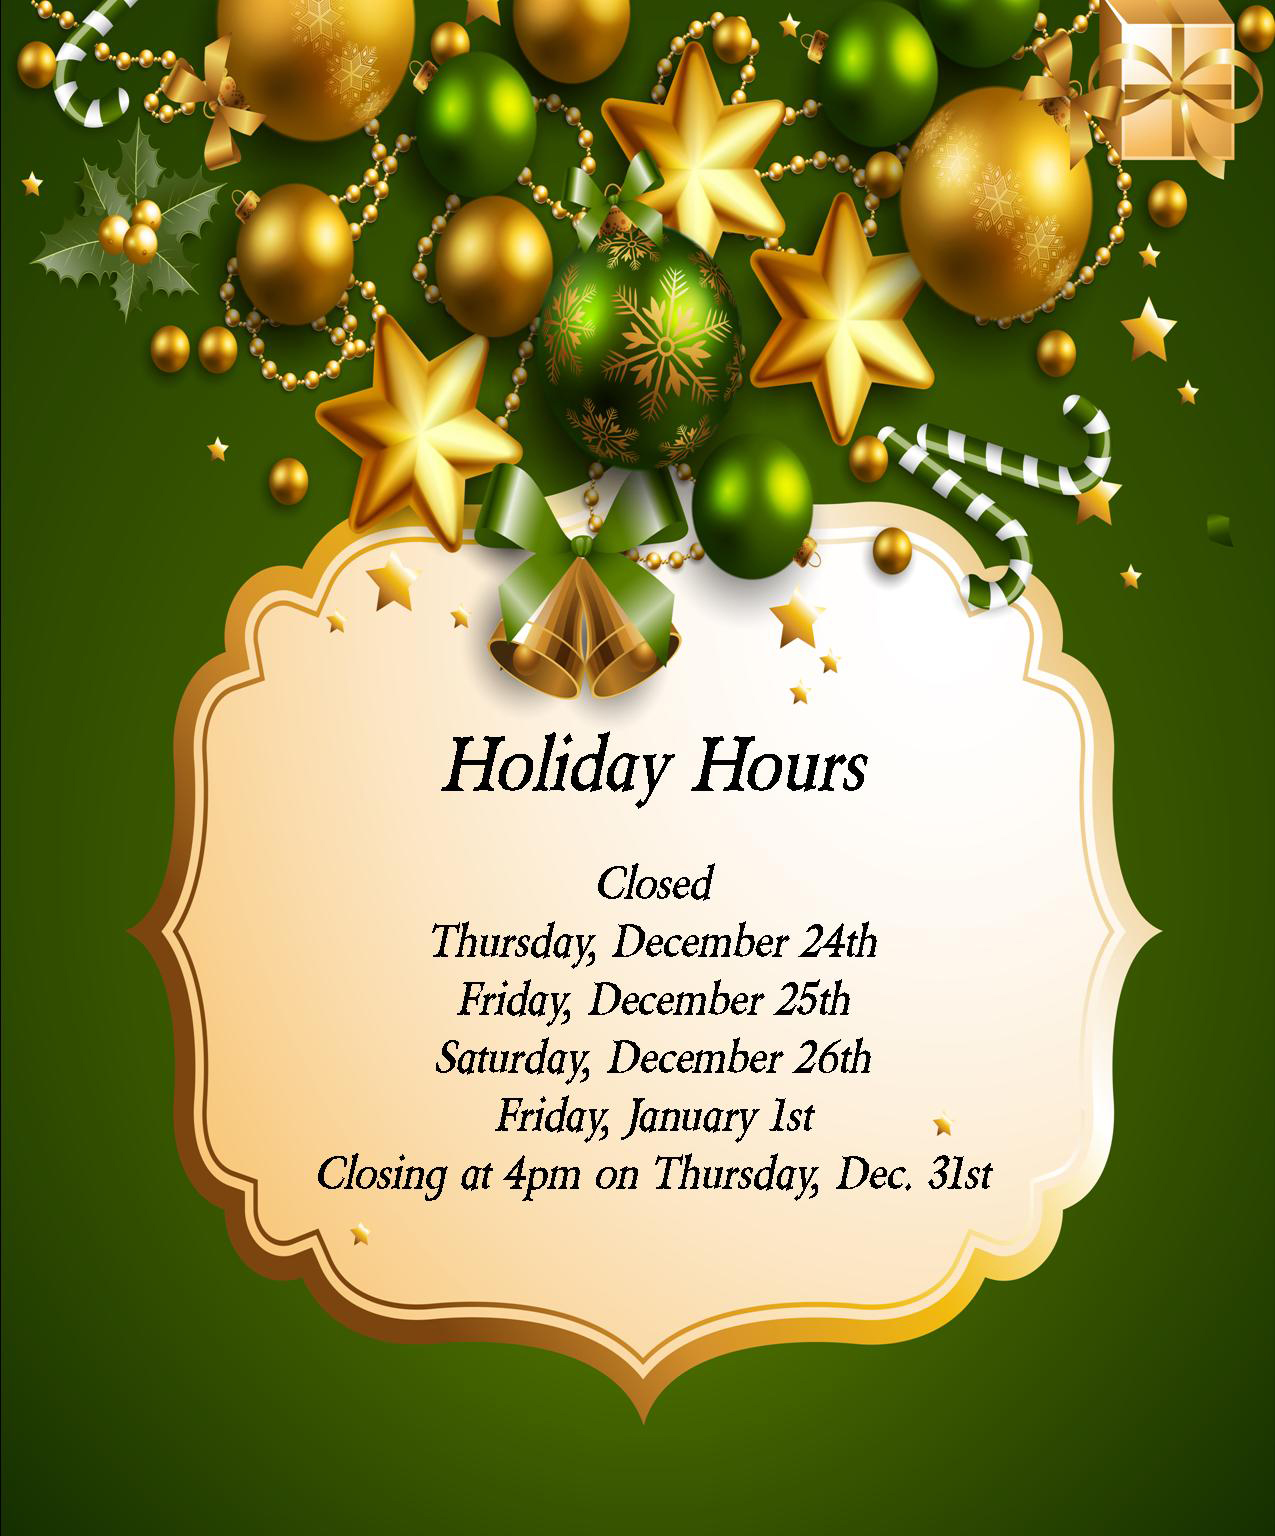 Christmas hours poster 2015